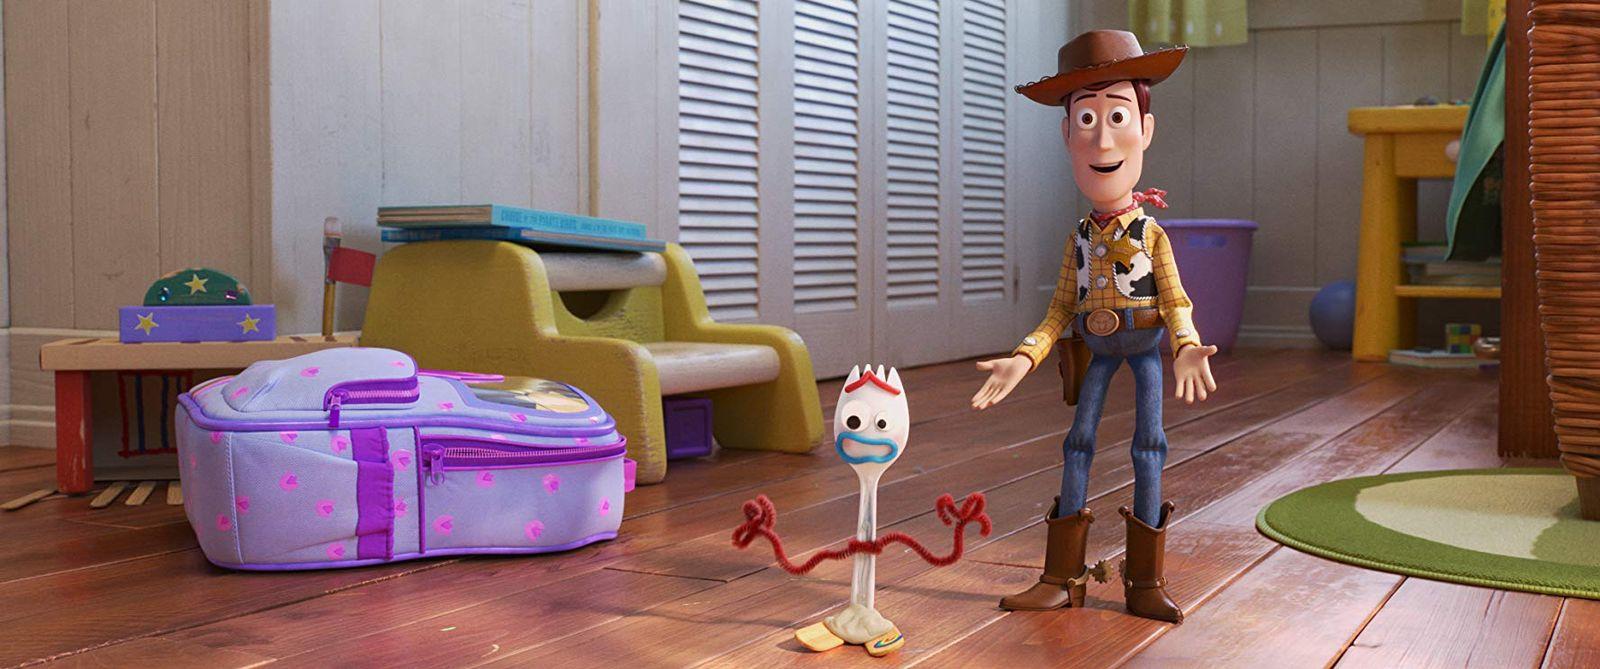 Toy Story 4 – chiar si jucariile se maturizeaza